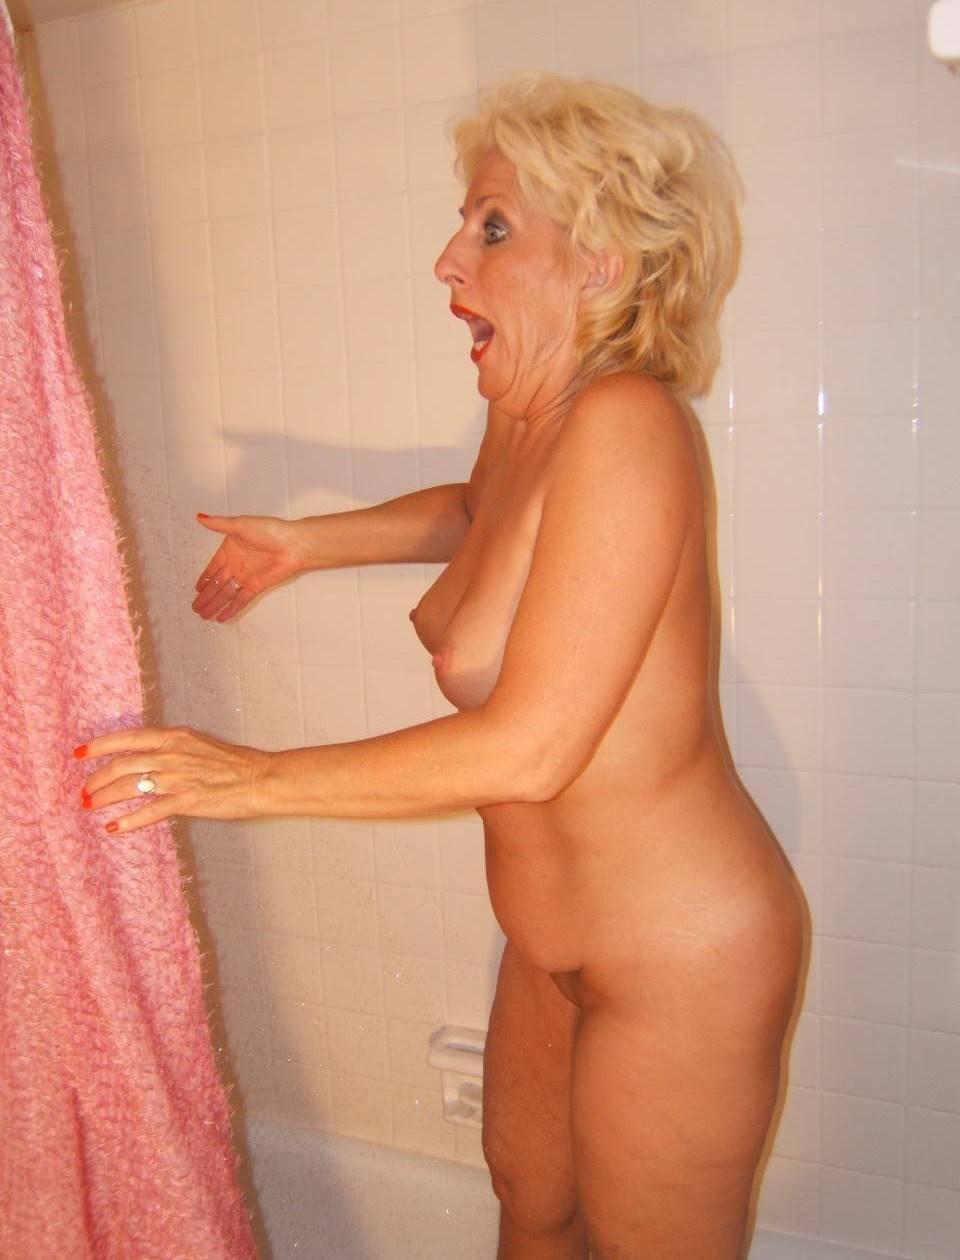 Nice amateur boob